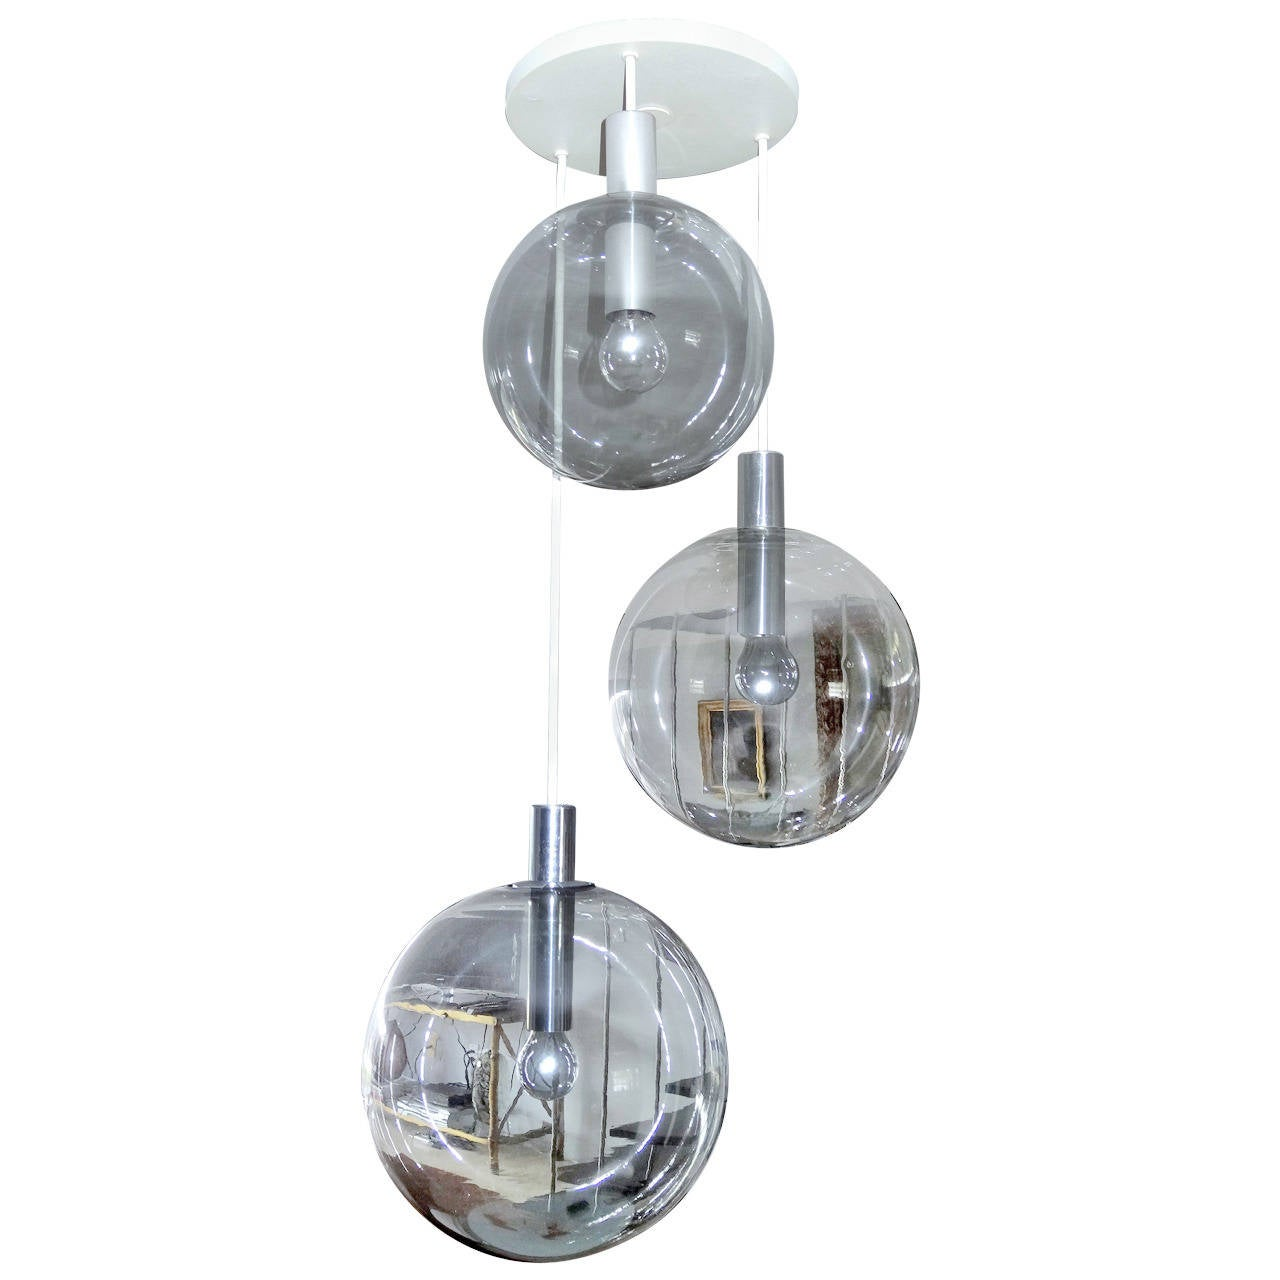 Smoked Glass Ball Chandelier